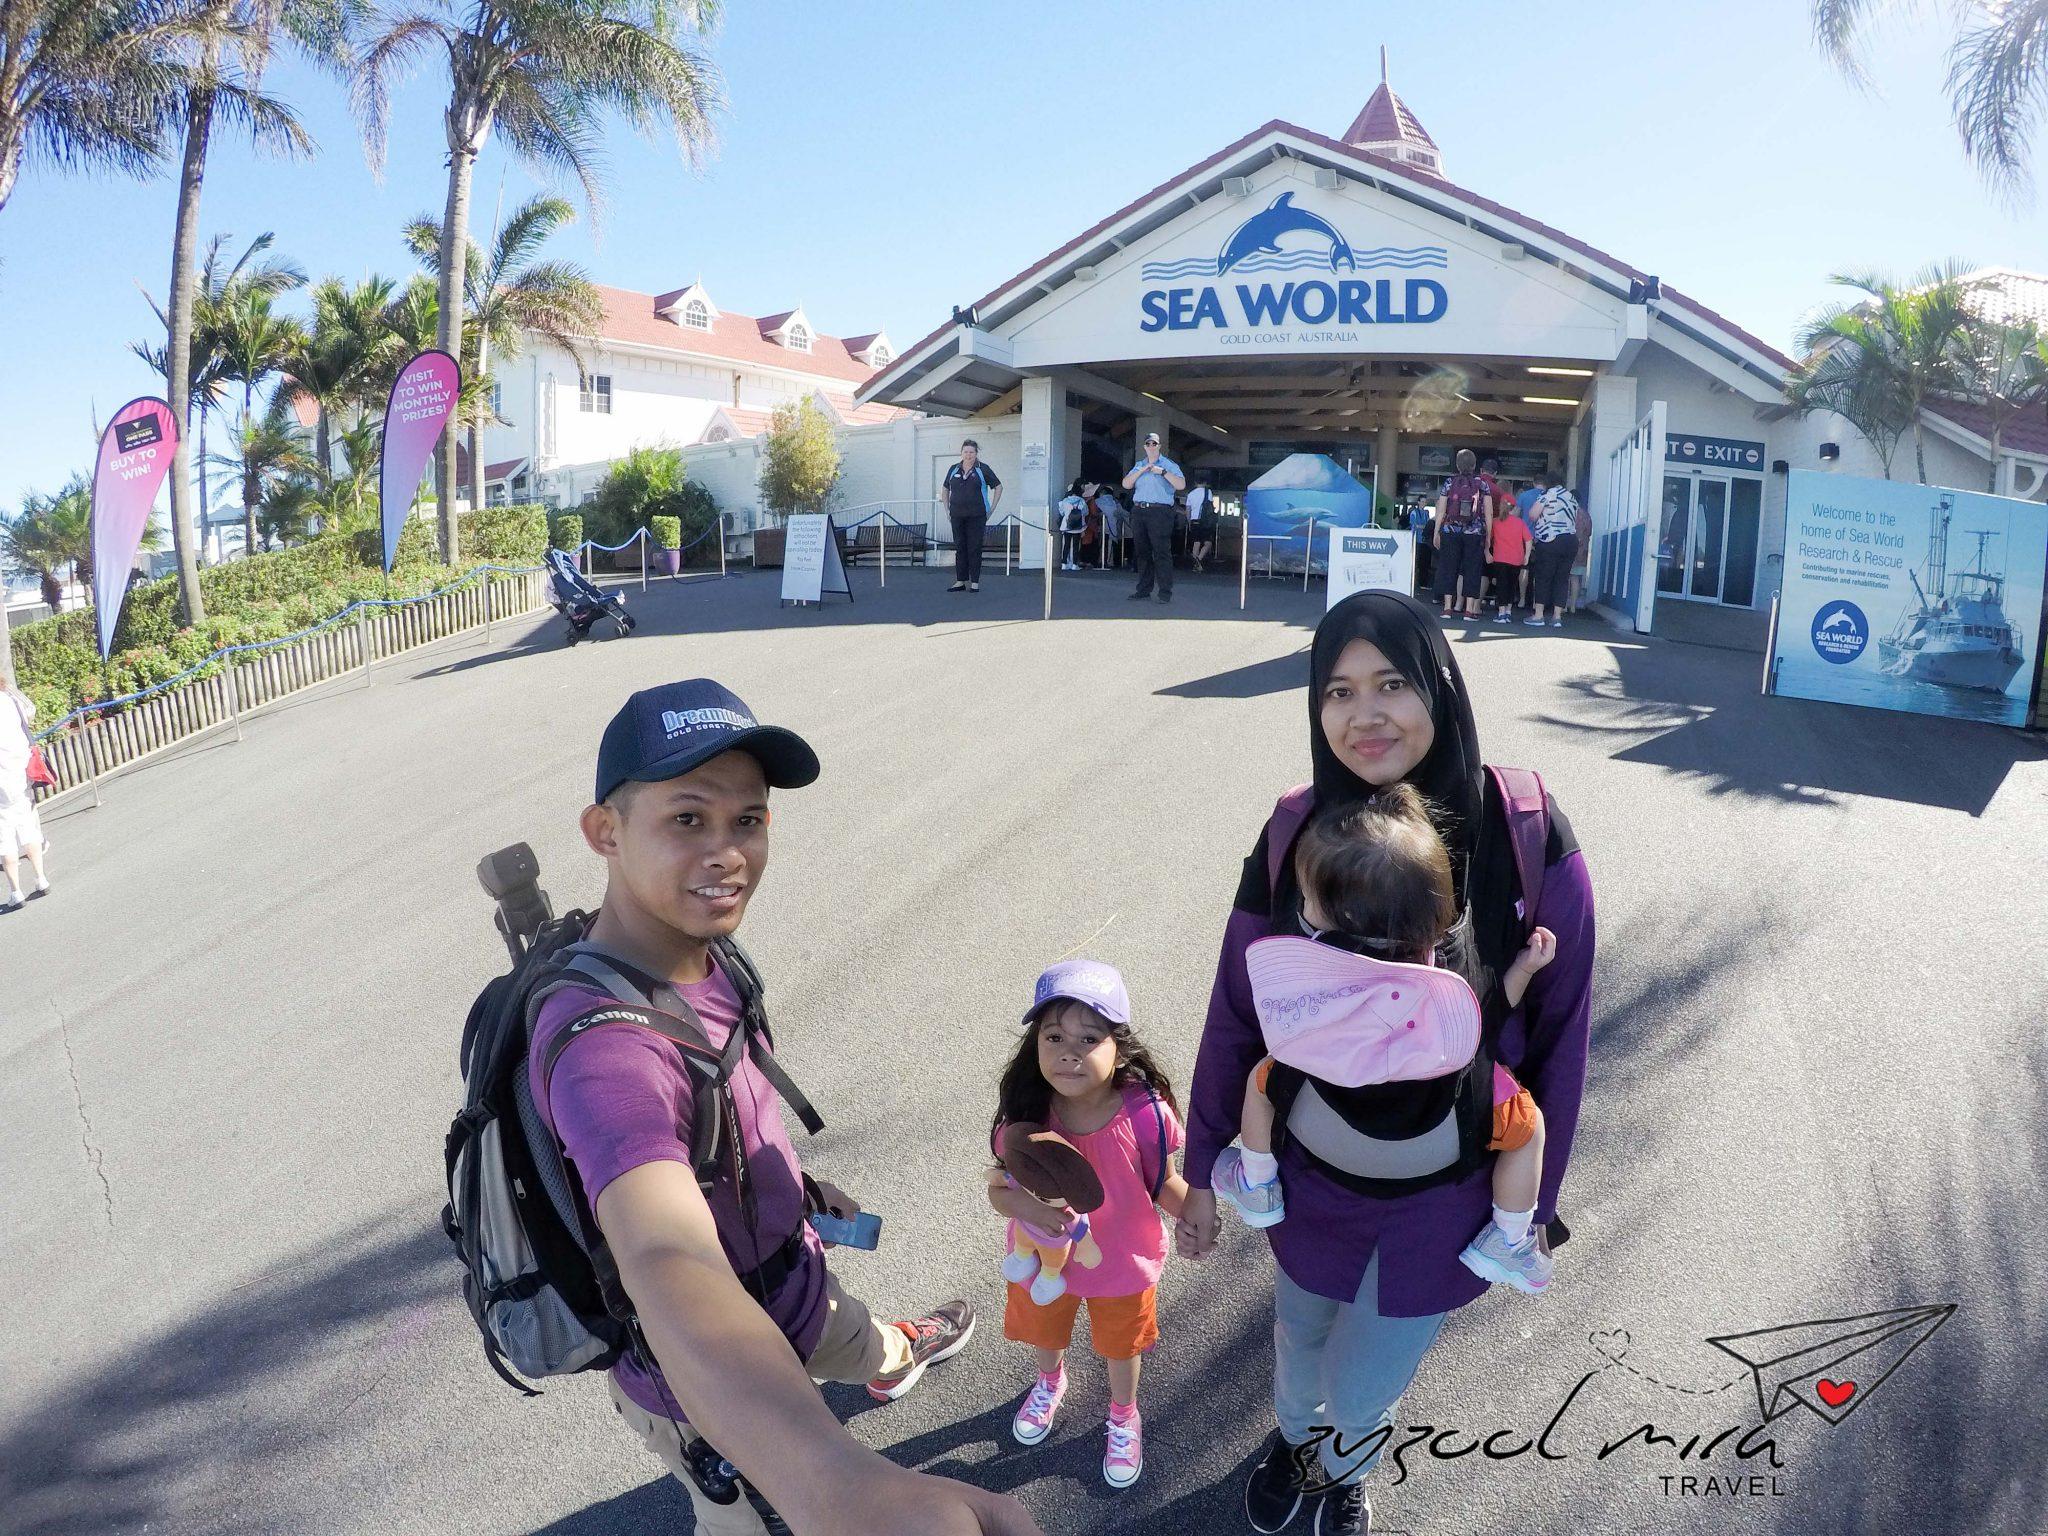 Hari ke-5 seharian di Sea World, Gold Coast Australia